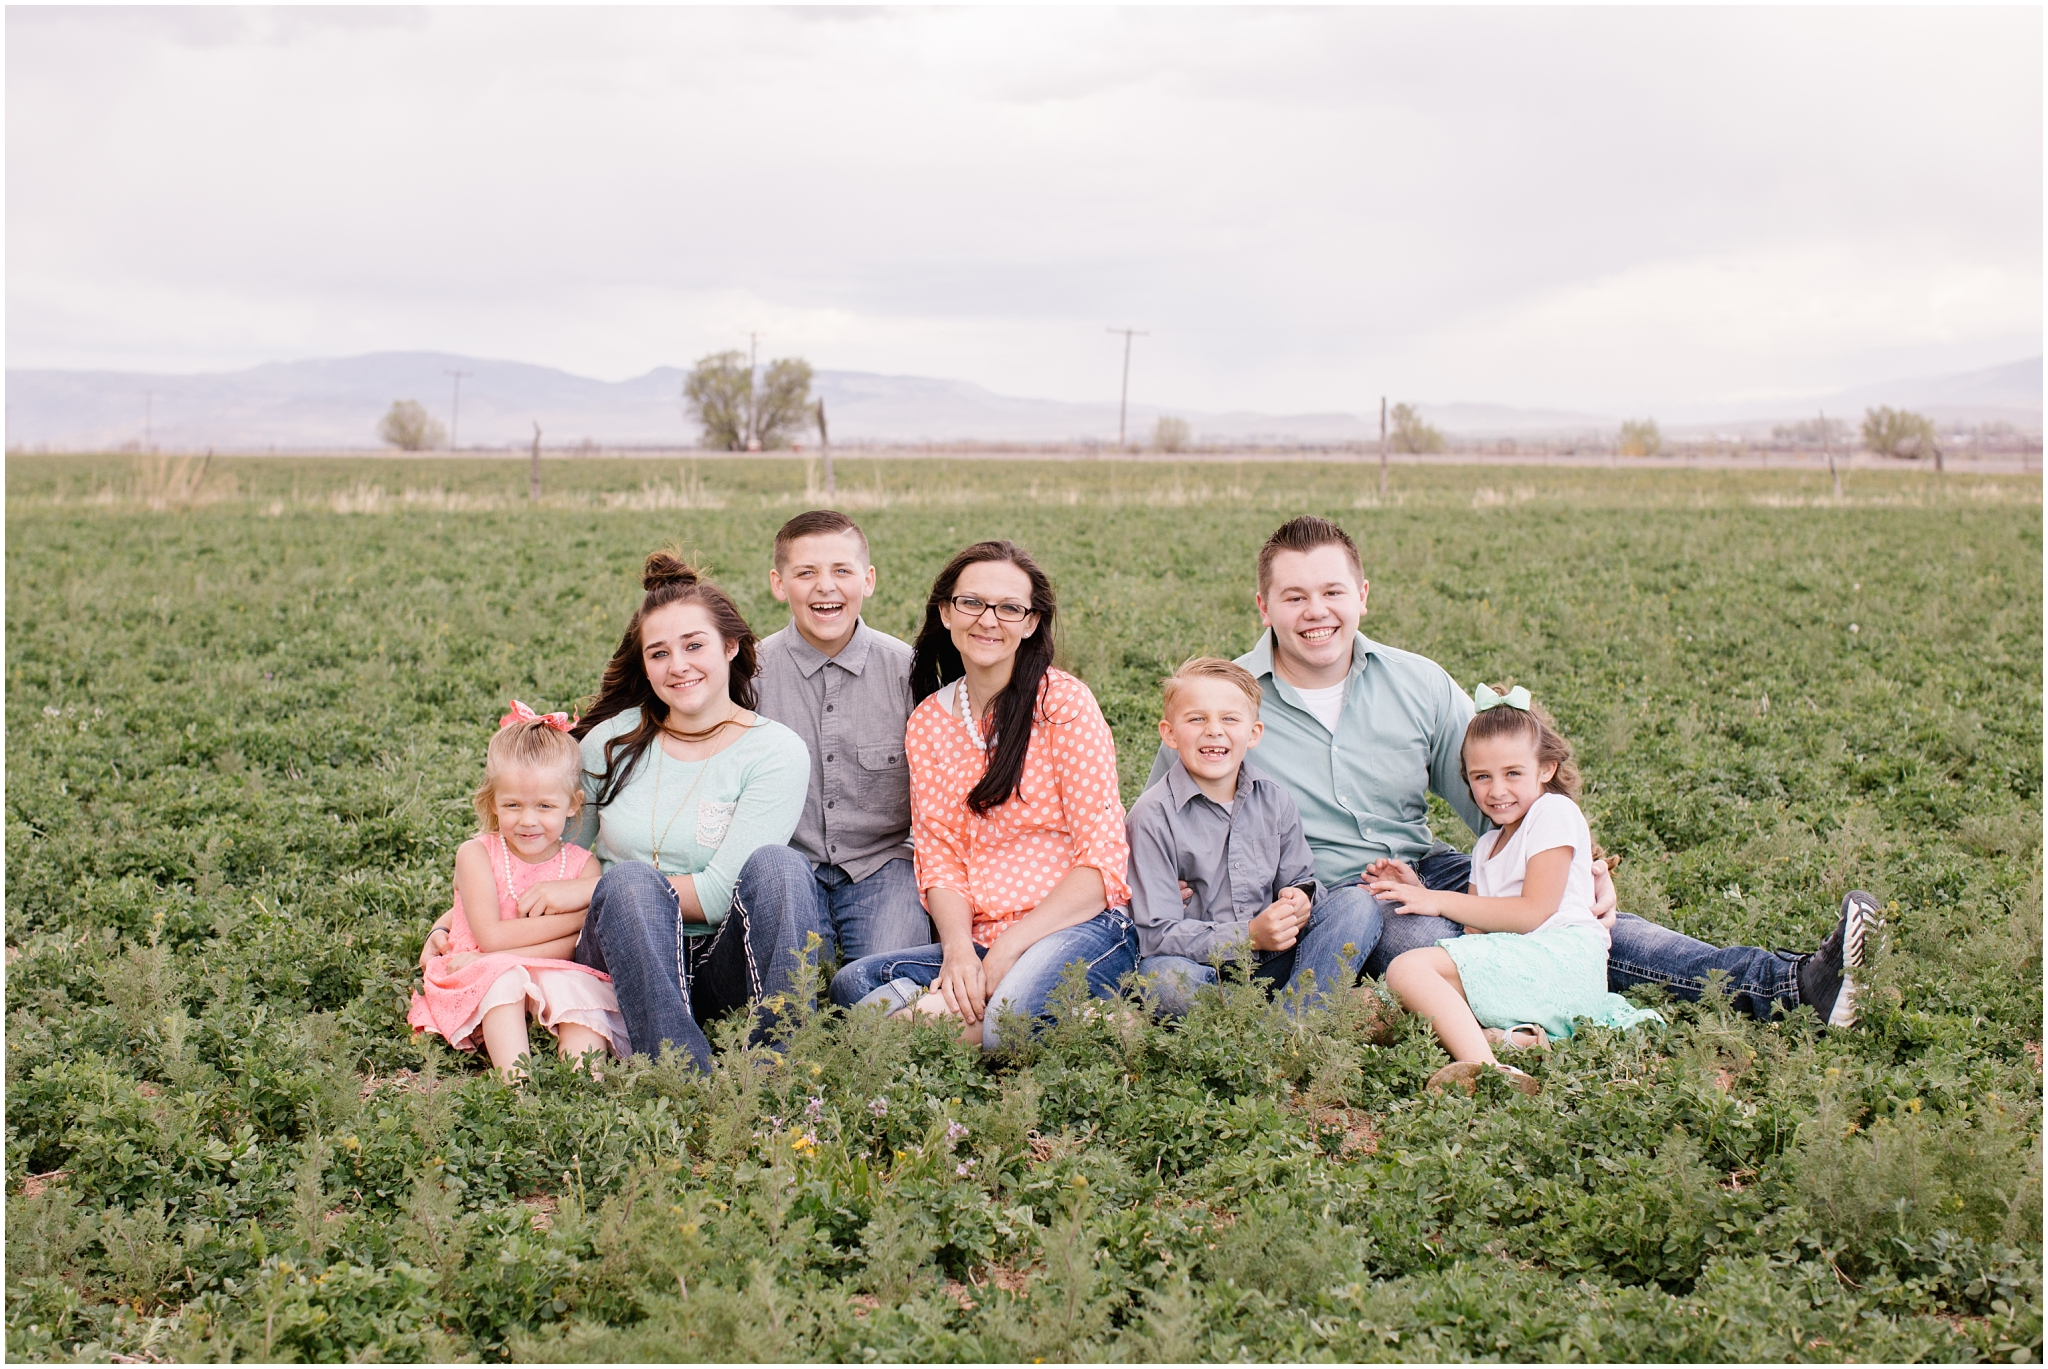 Conner-30_Lizzie-B-Imagery-Utah-Family-Photographer-Salt-Lake-City-Park-City-Utah-County.jpg